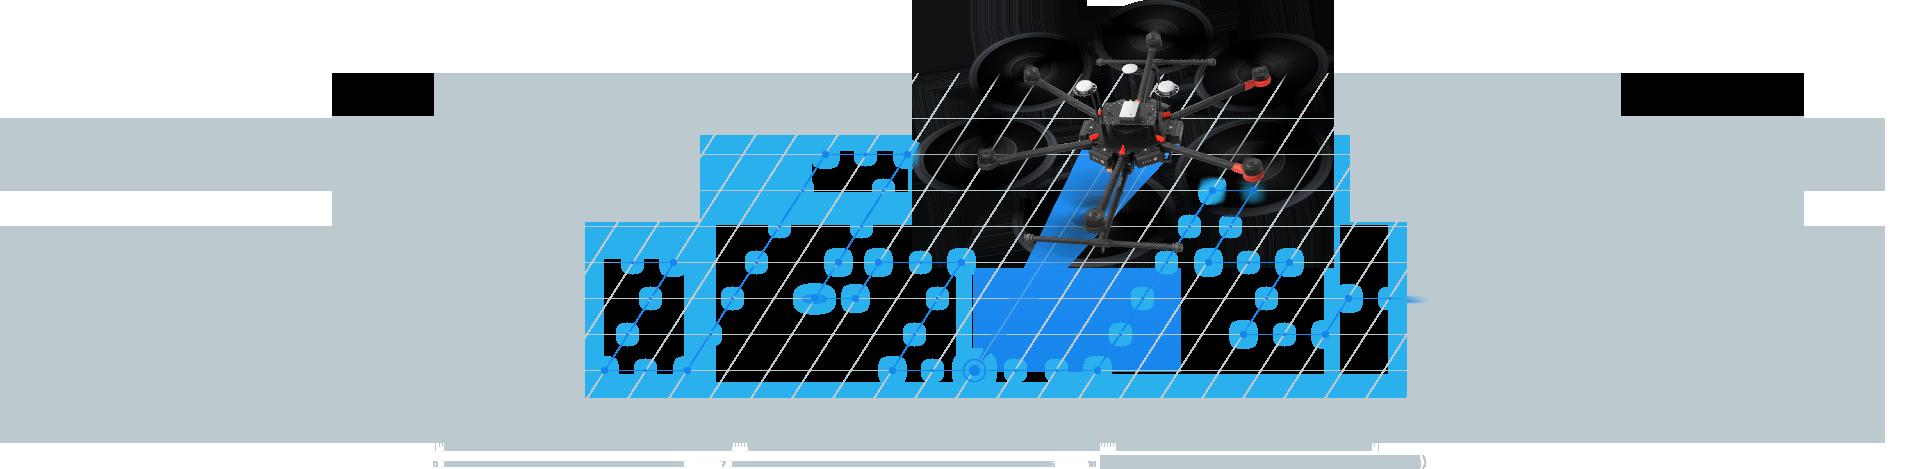 rtk地面基准站矢量图